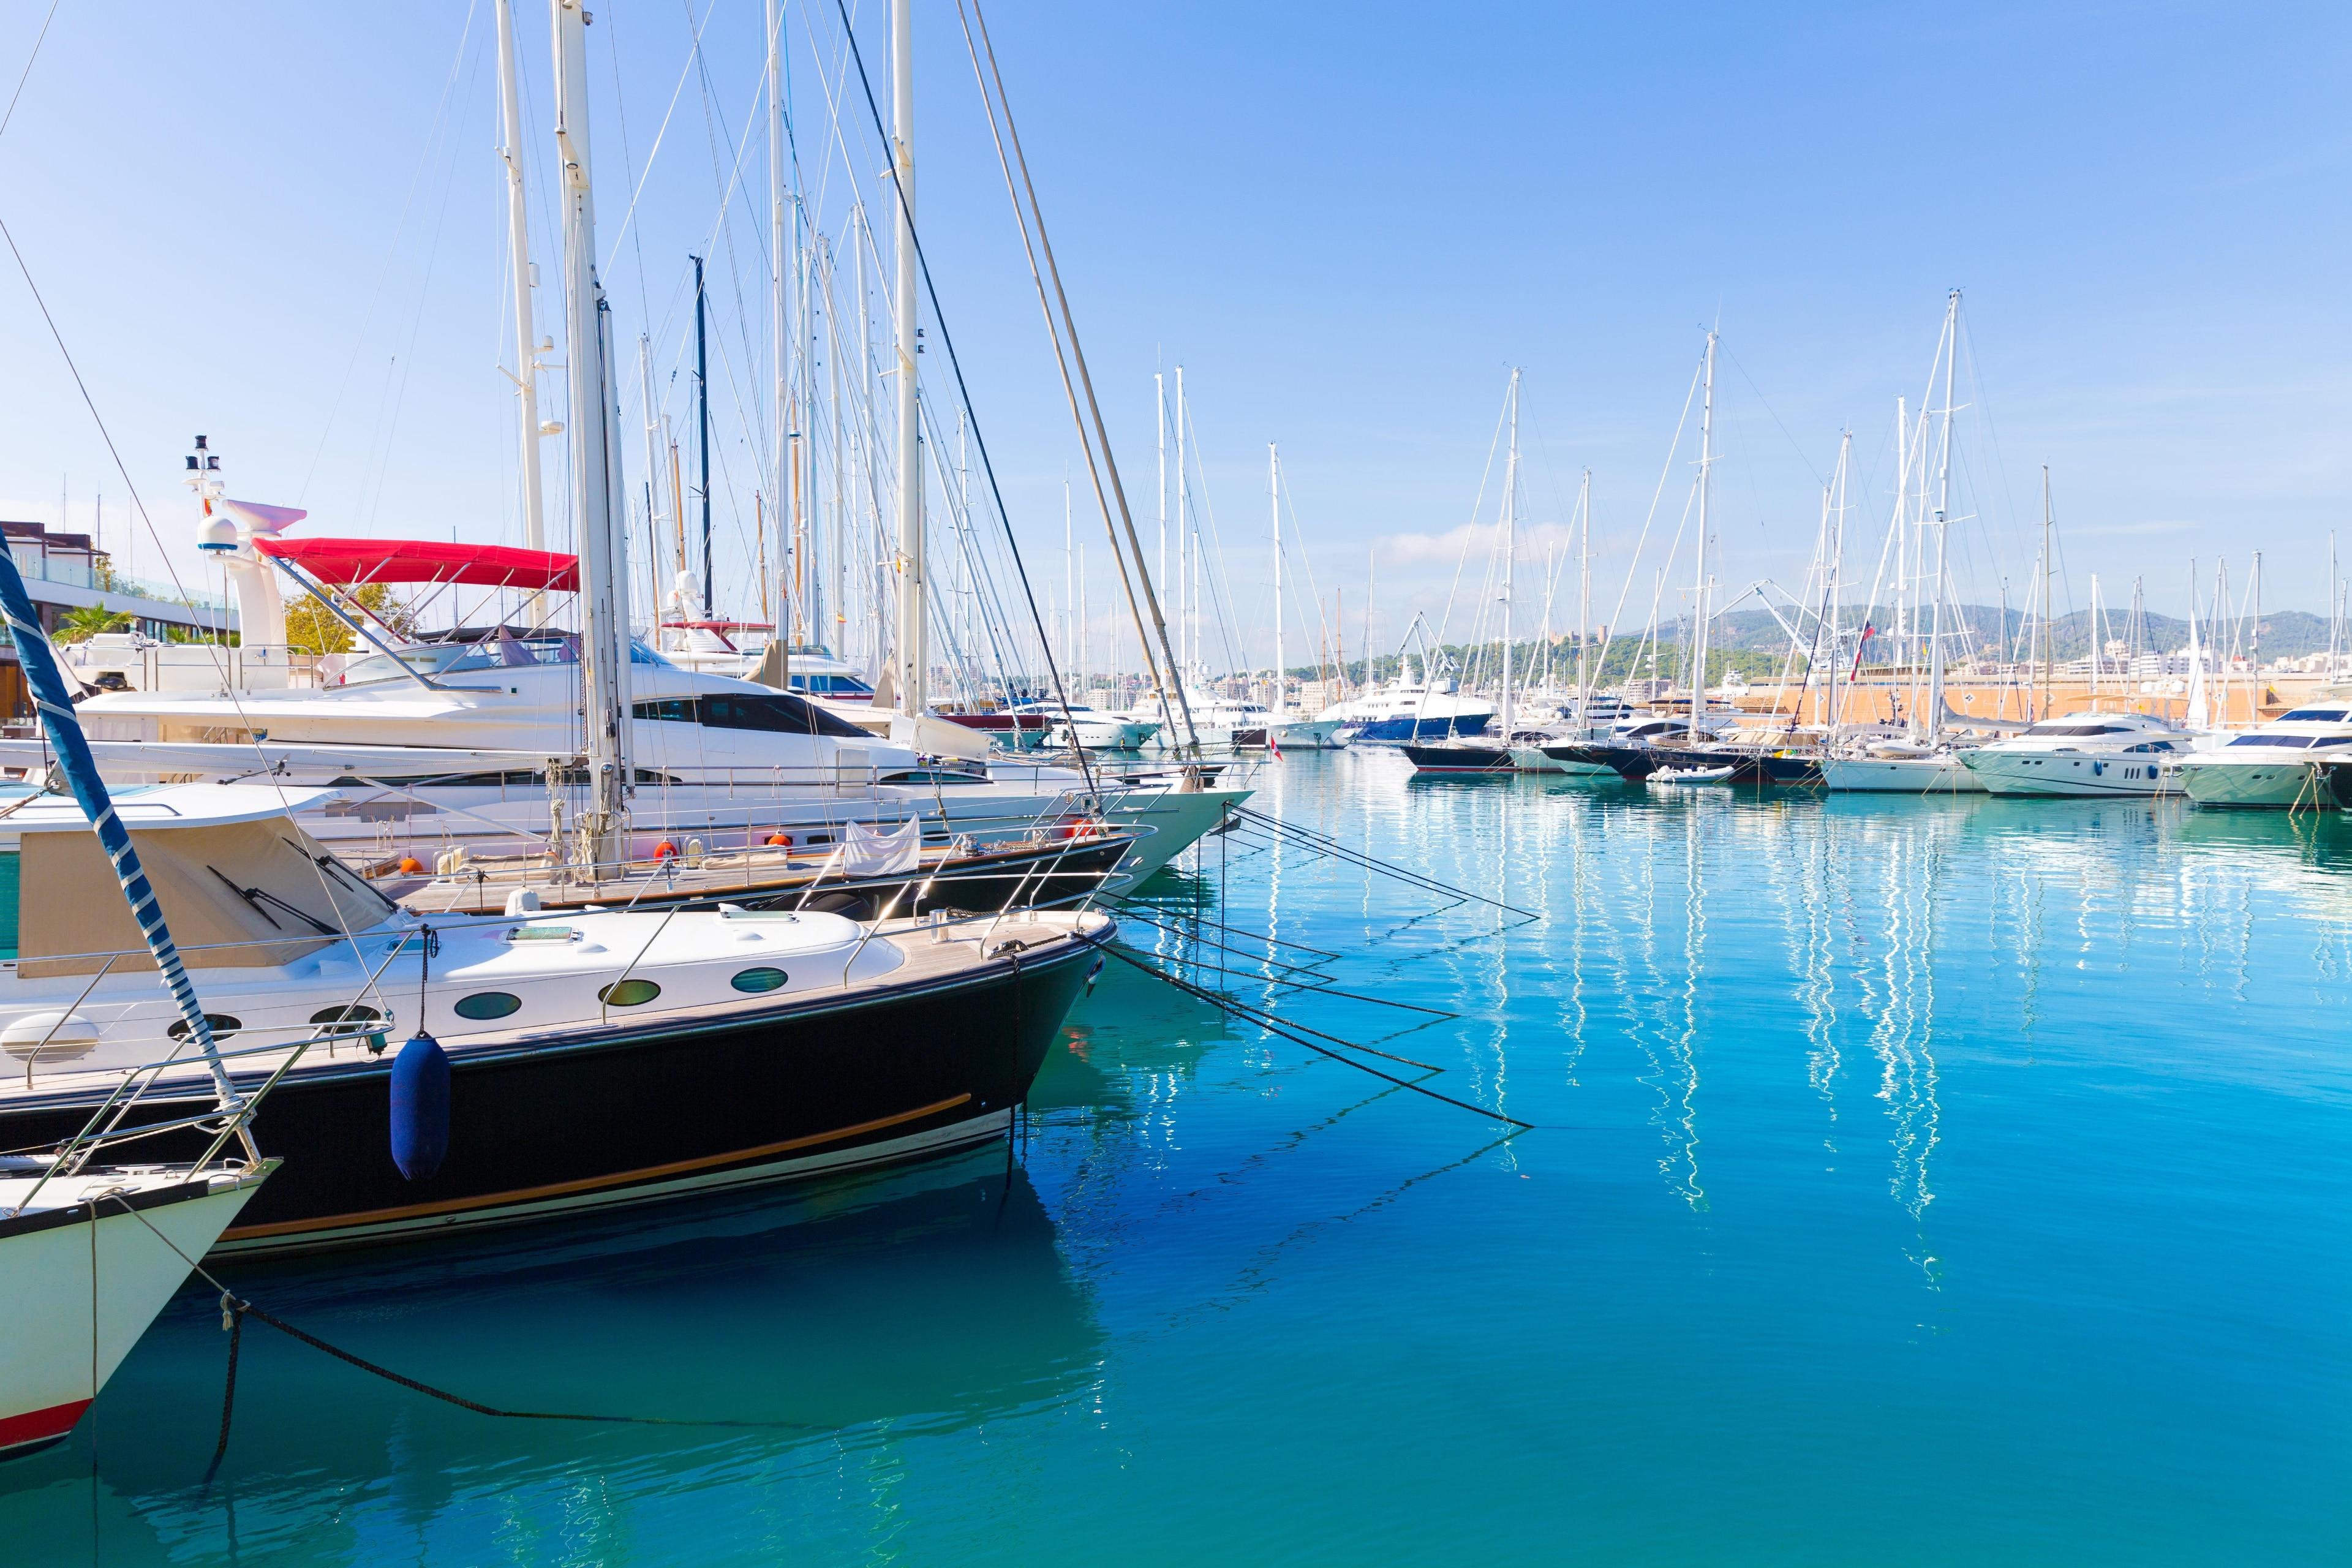 Port of Palma de Mallorca, Palma de Mallorca, Balearic Islands, Spain